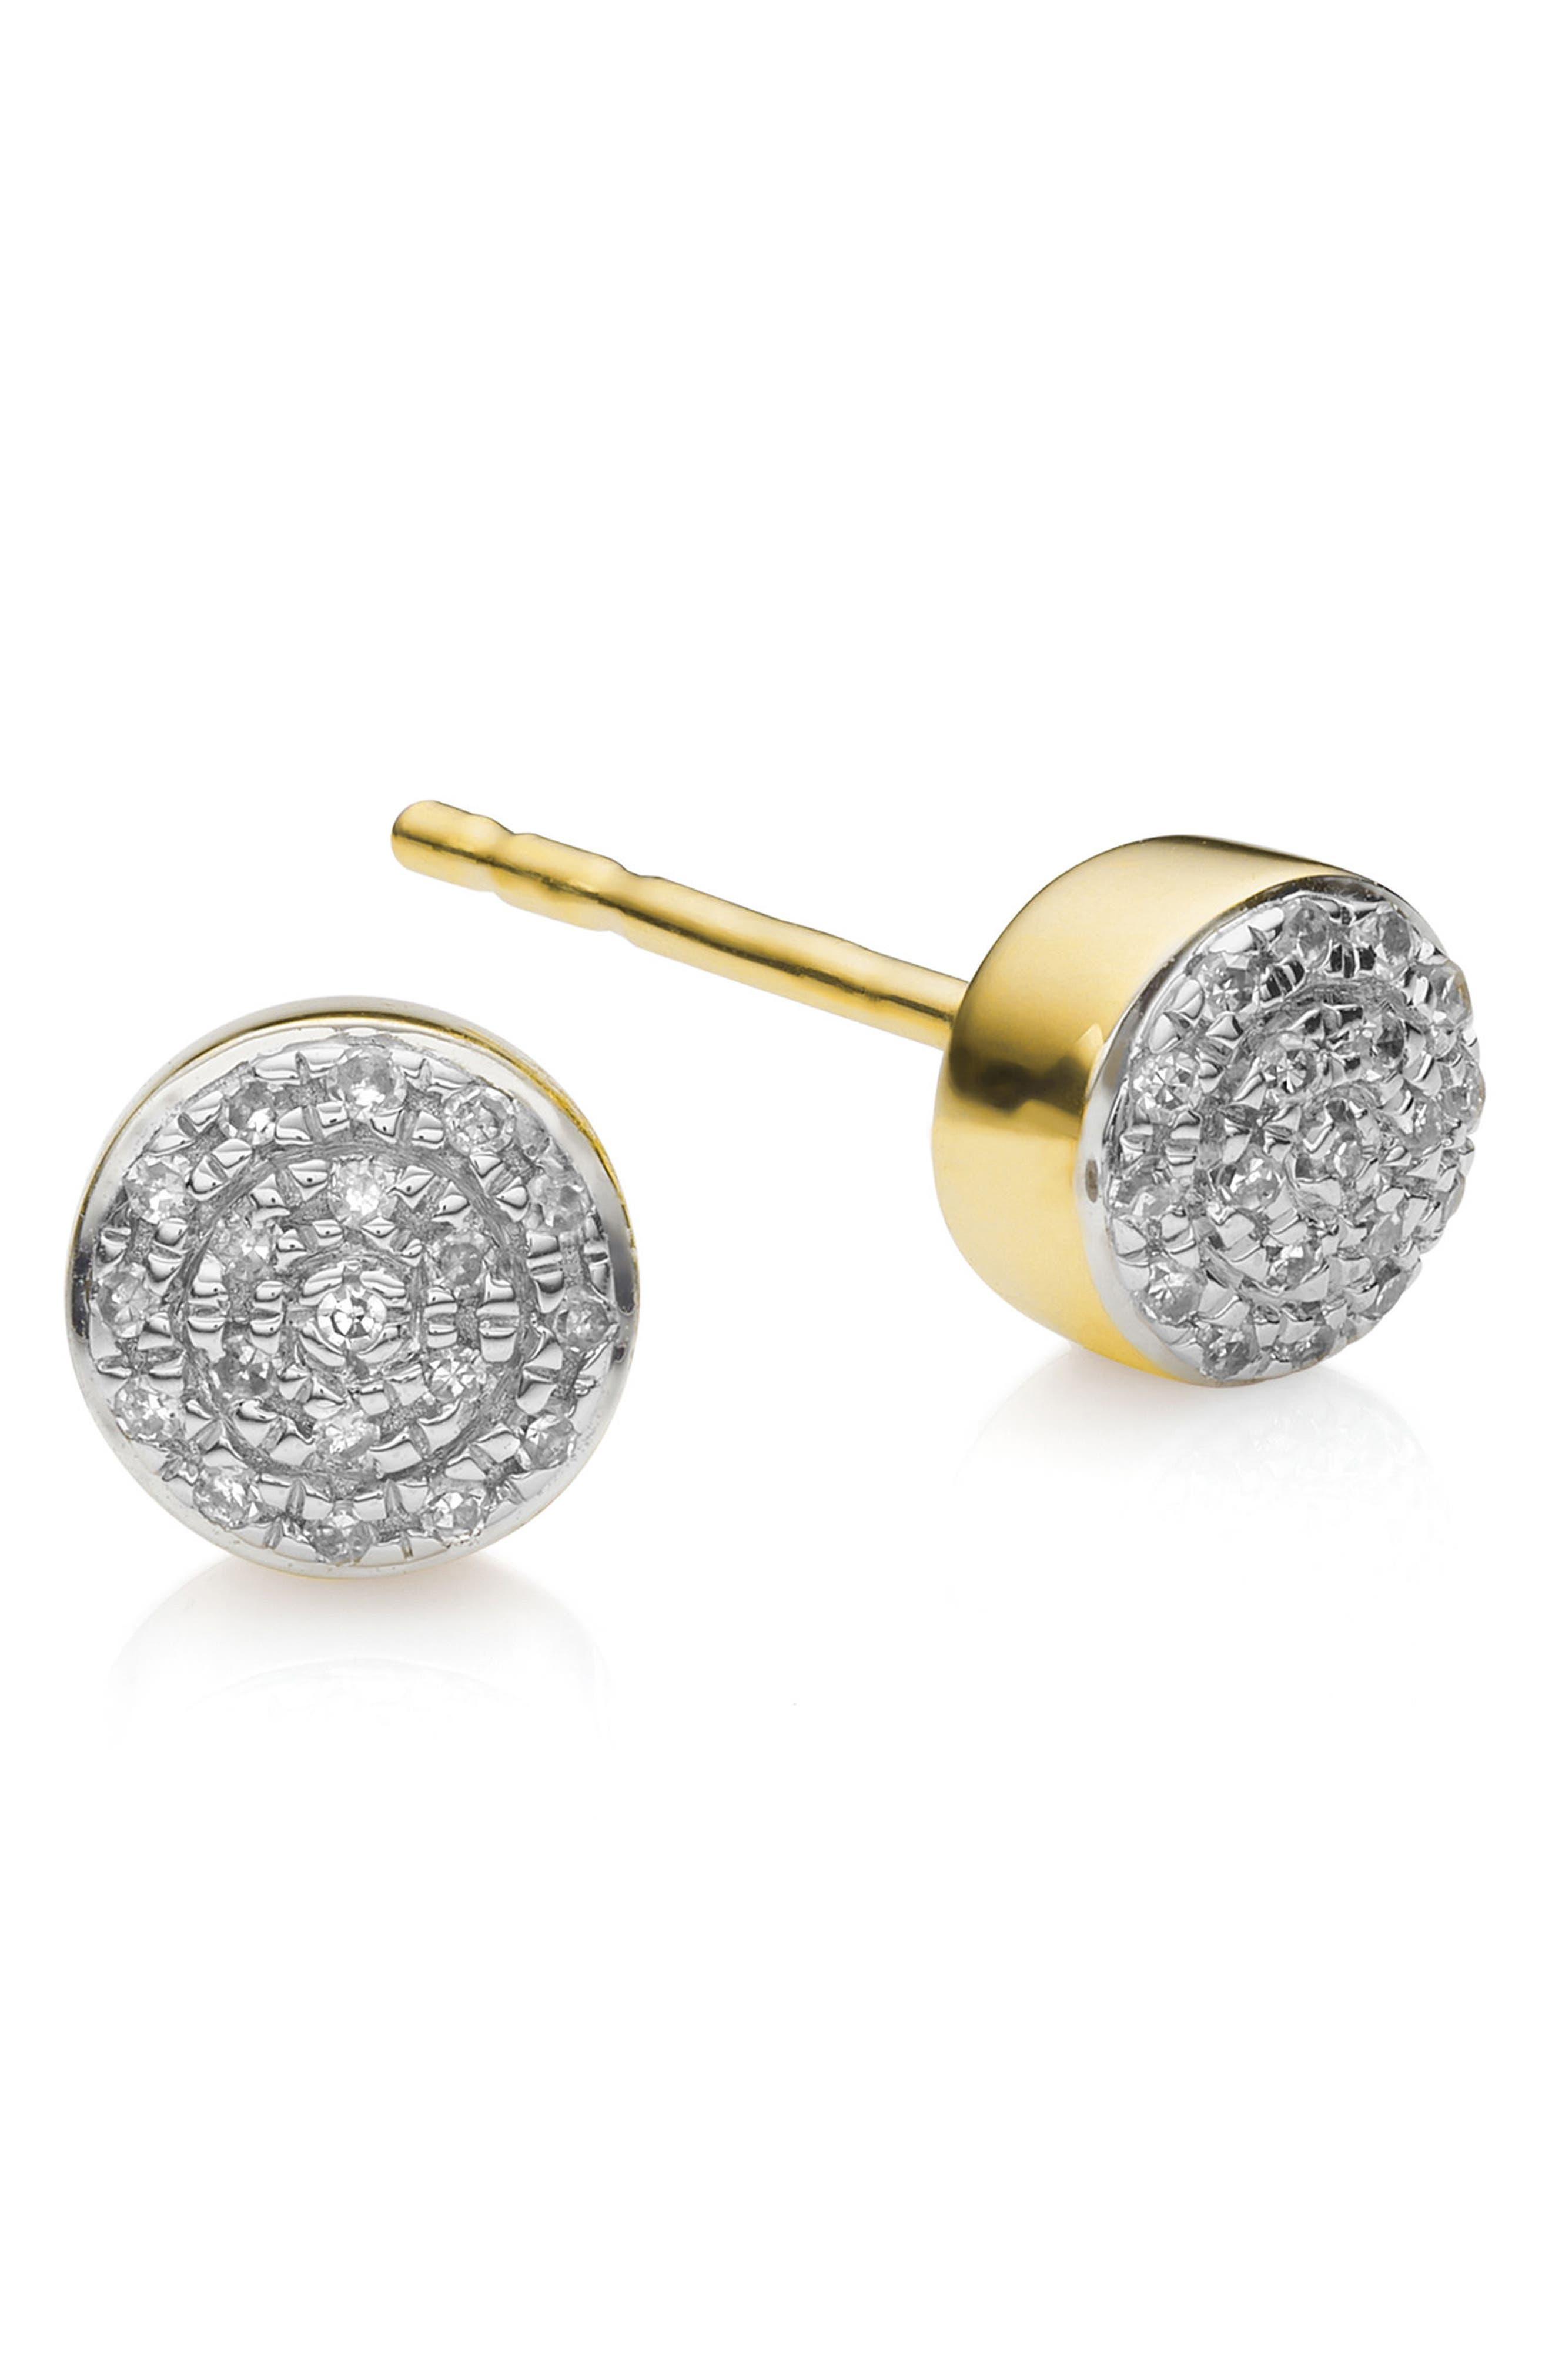 MONICA VINADER Fiji Mini Diamond Button Stud Earrings, Main, color, GOLD